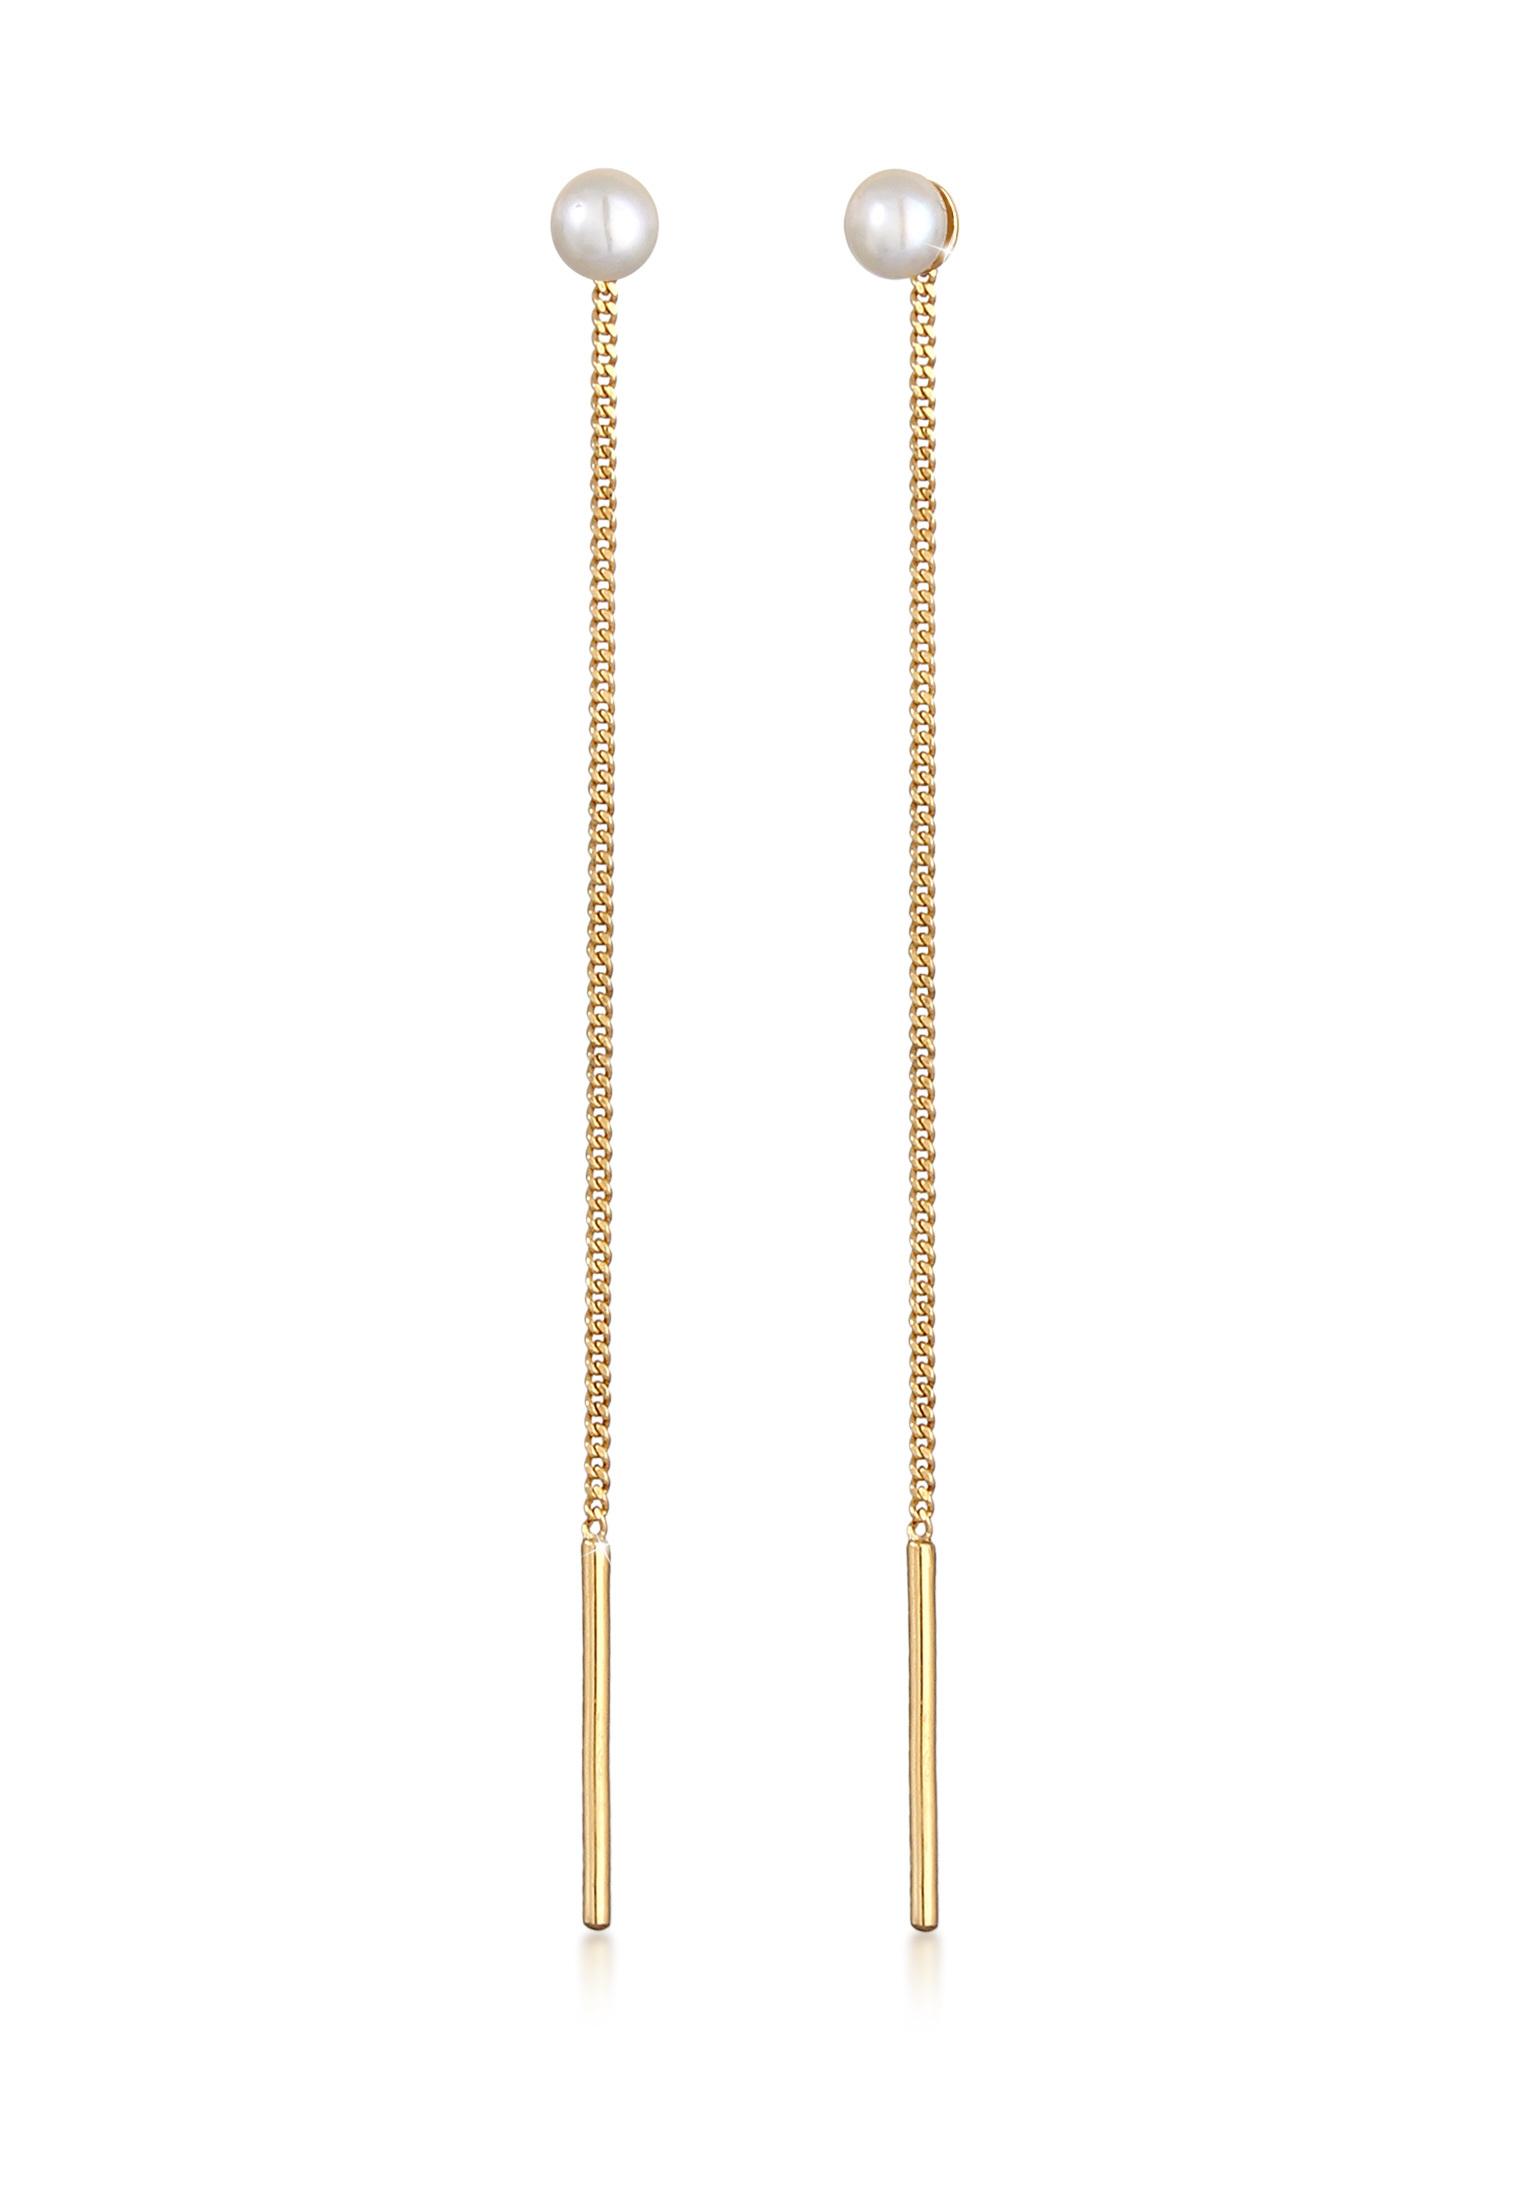 Ohrhänger Ear Chain   Süßwasserperle   925 Sterling Silber vergoldet